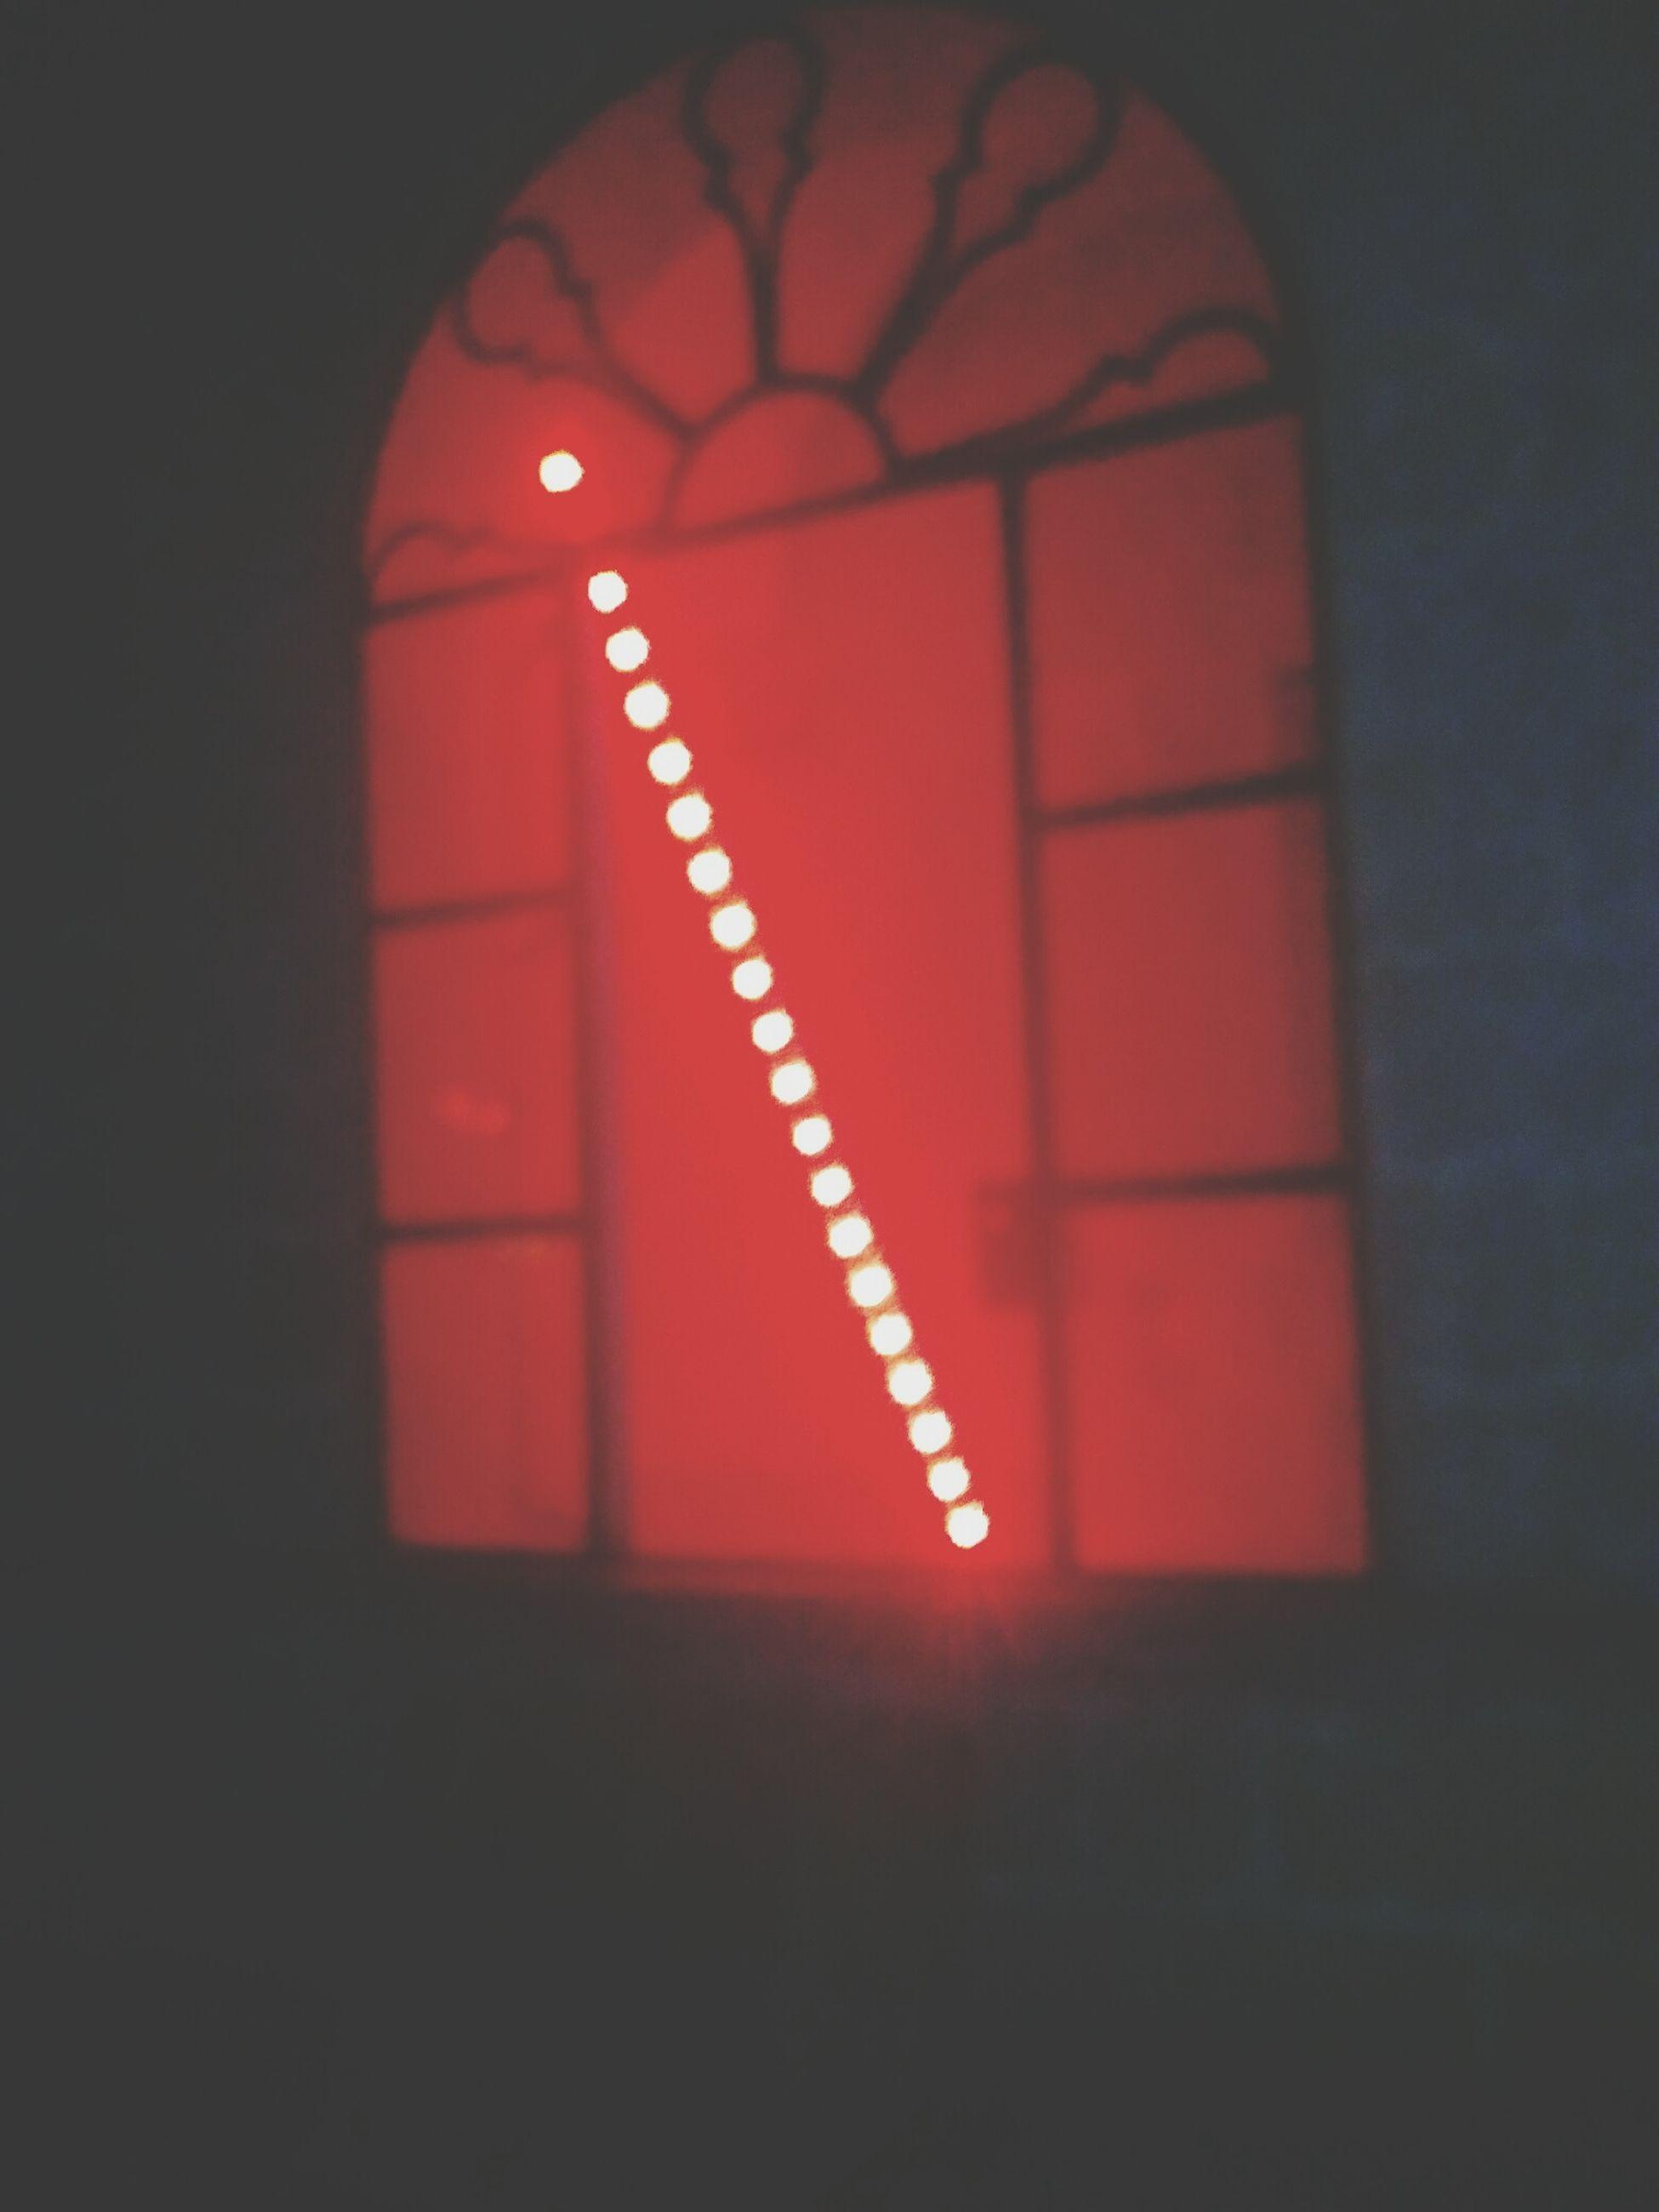 red, illuminated, close-up, no people, dark, geometric shape, vignette